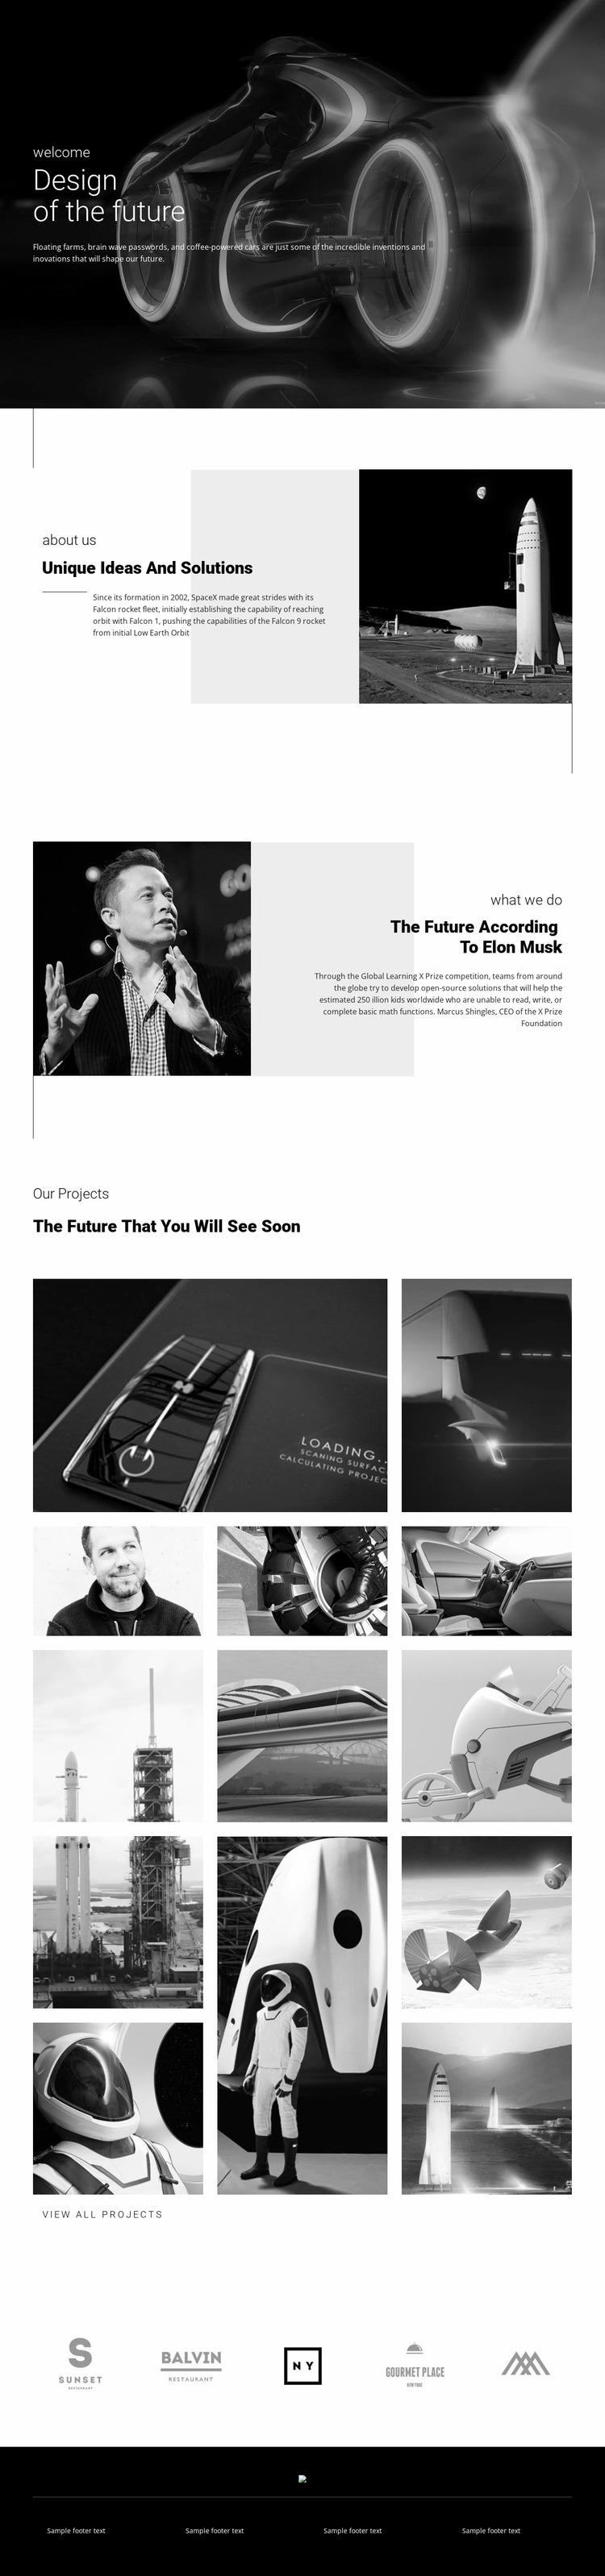 Design of future technology Website Mockup